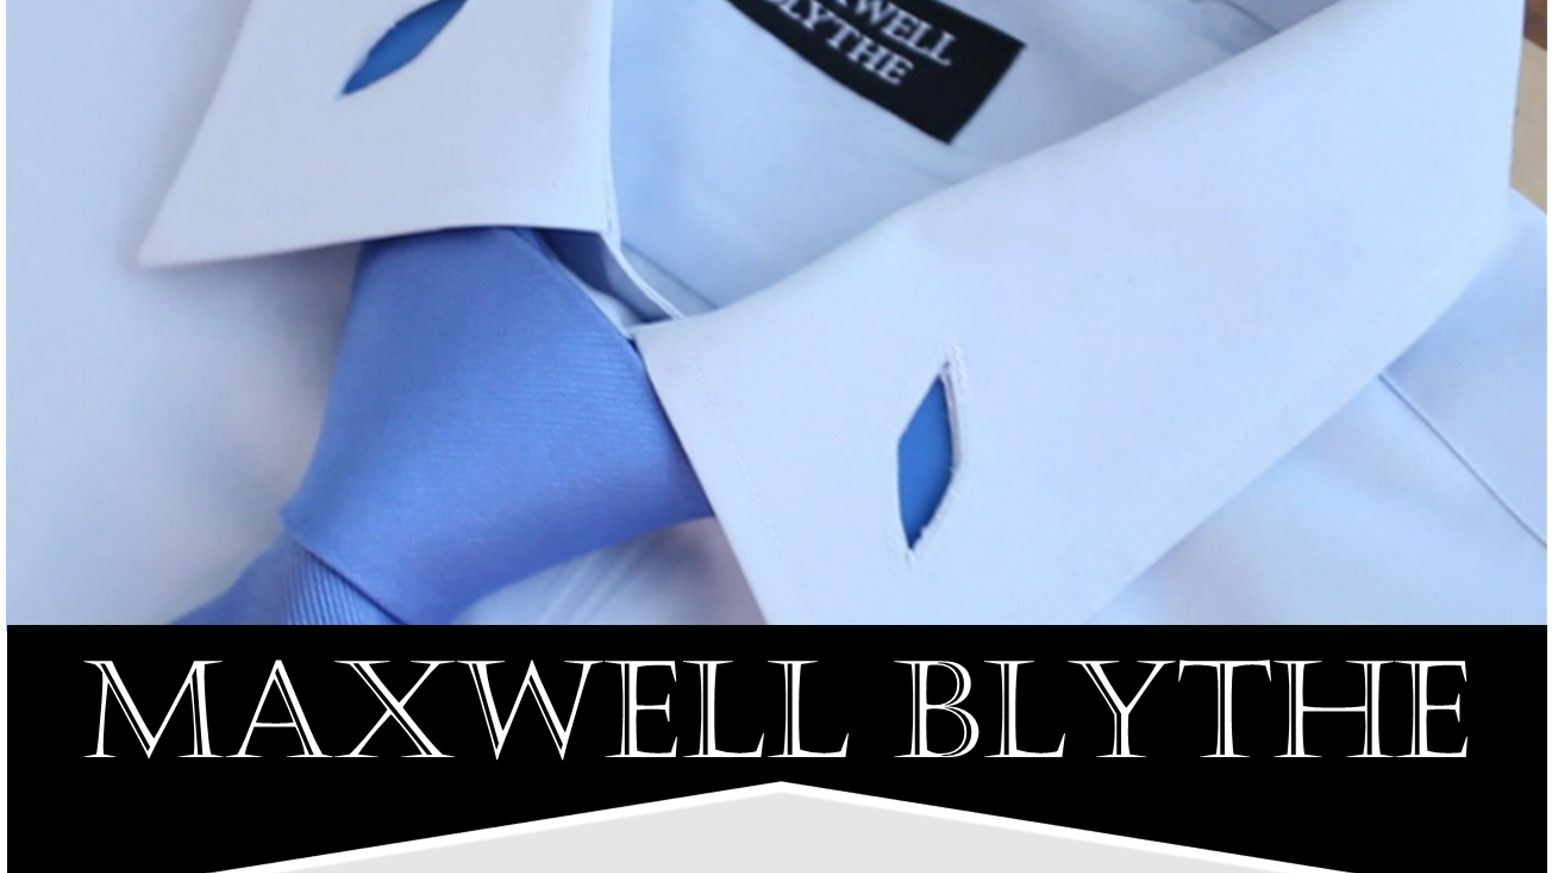 Maxwell Blythe 2013 Fenestra Dress Shirt Collar Stays By Maxwell